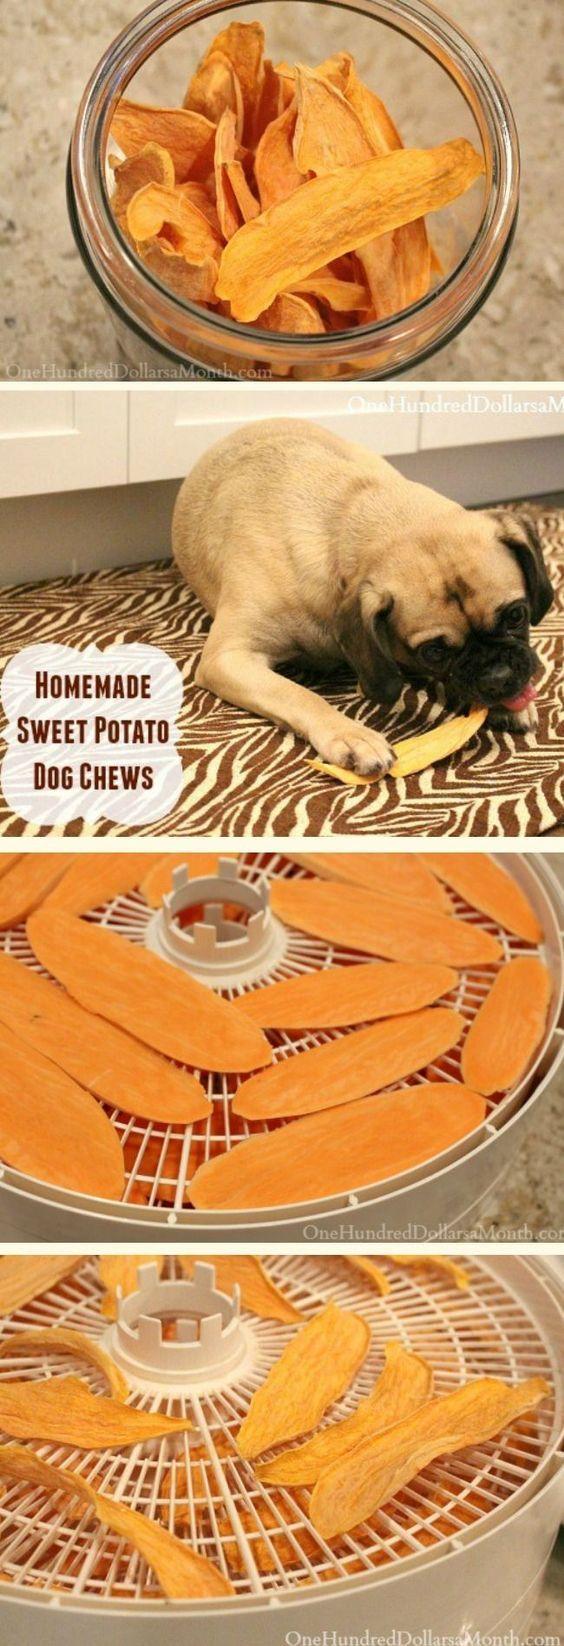 Homemade Sweet Potato Dog Chews Sweet potato dog chews